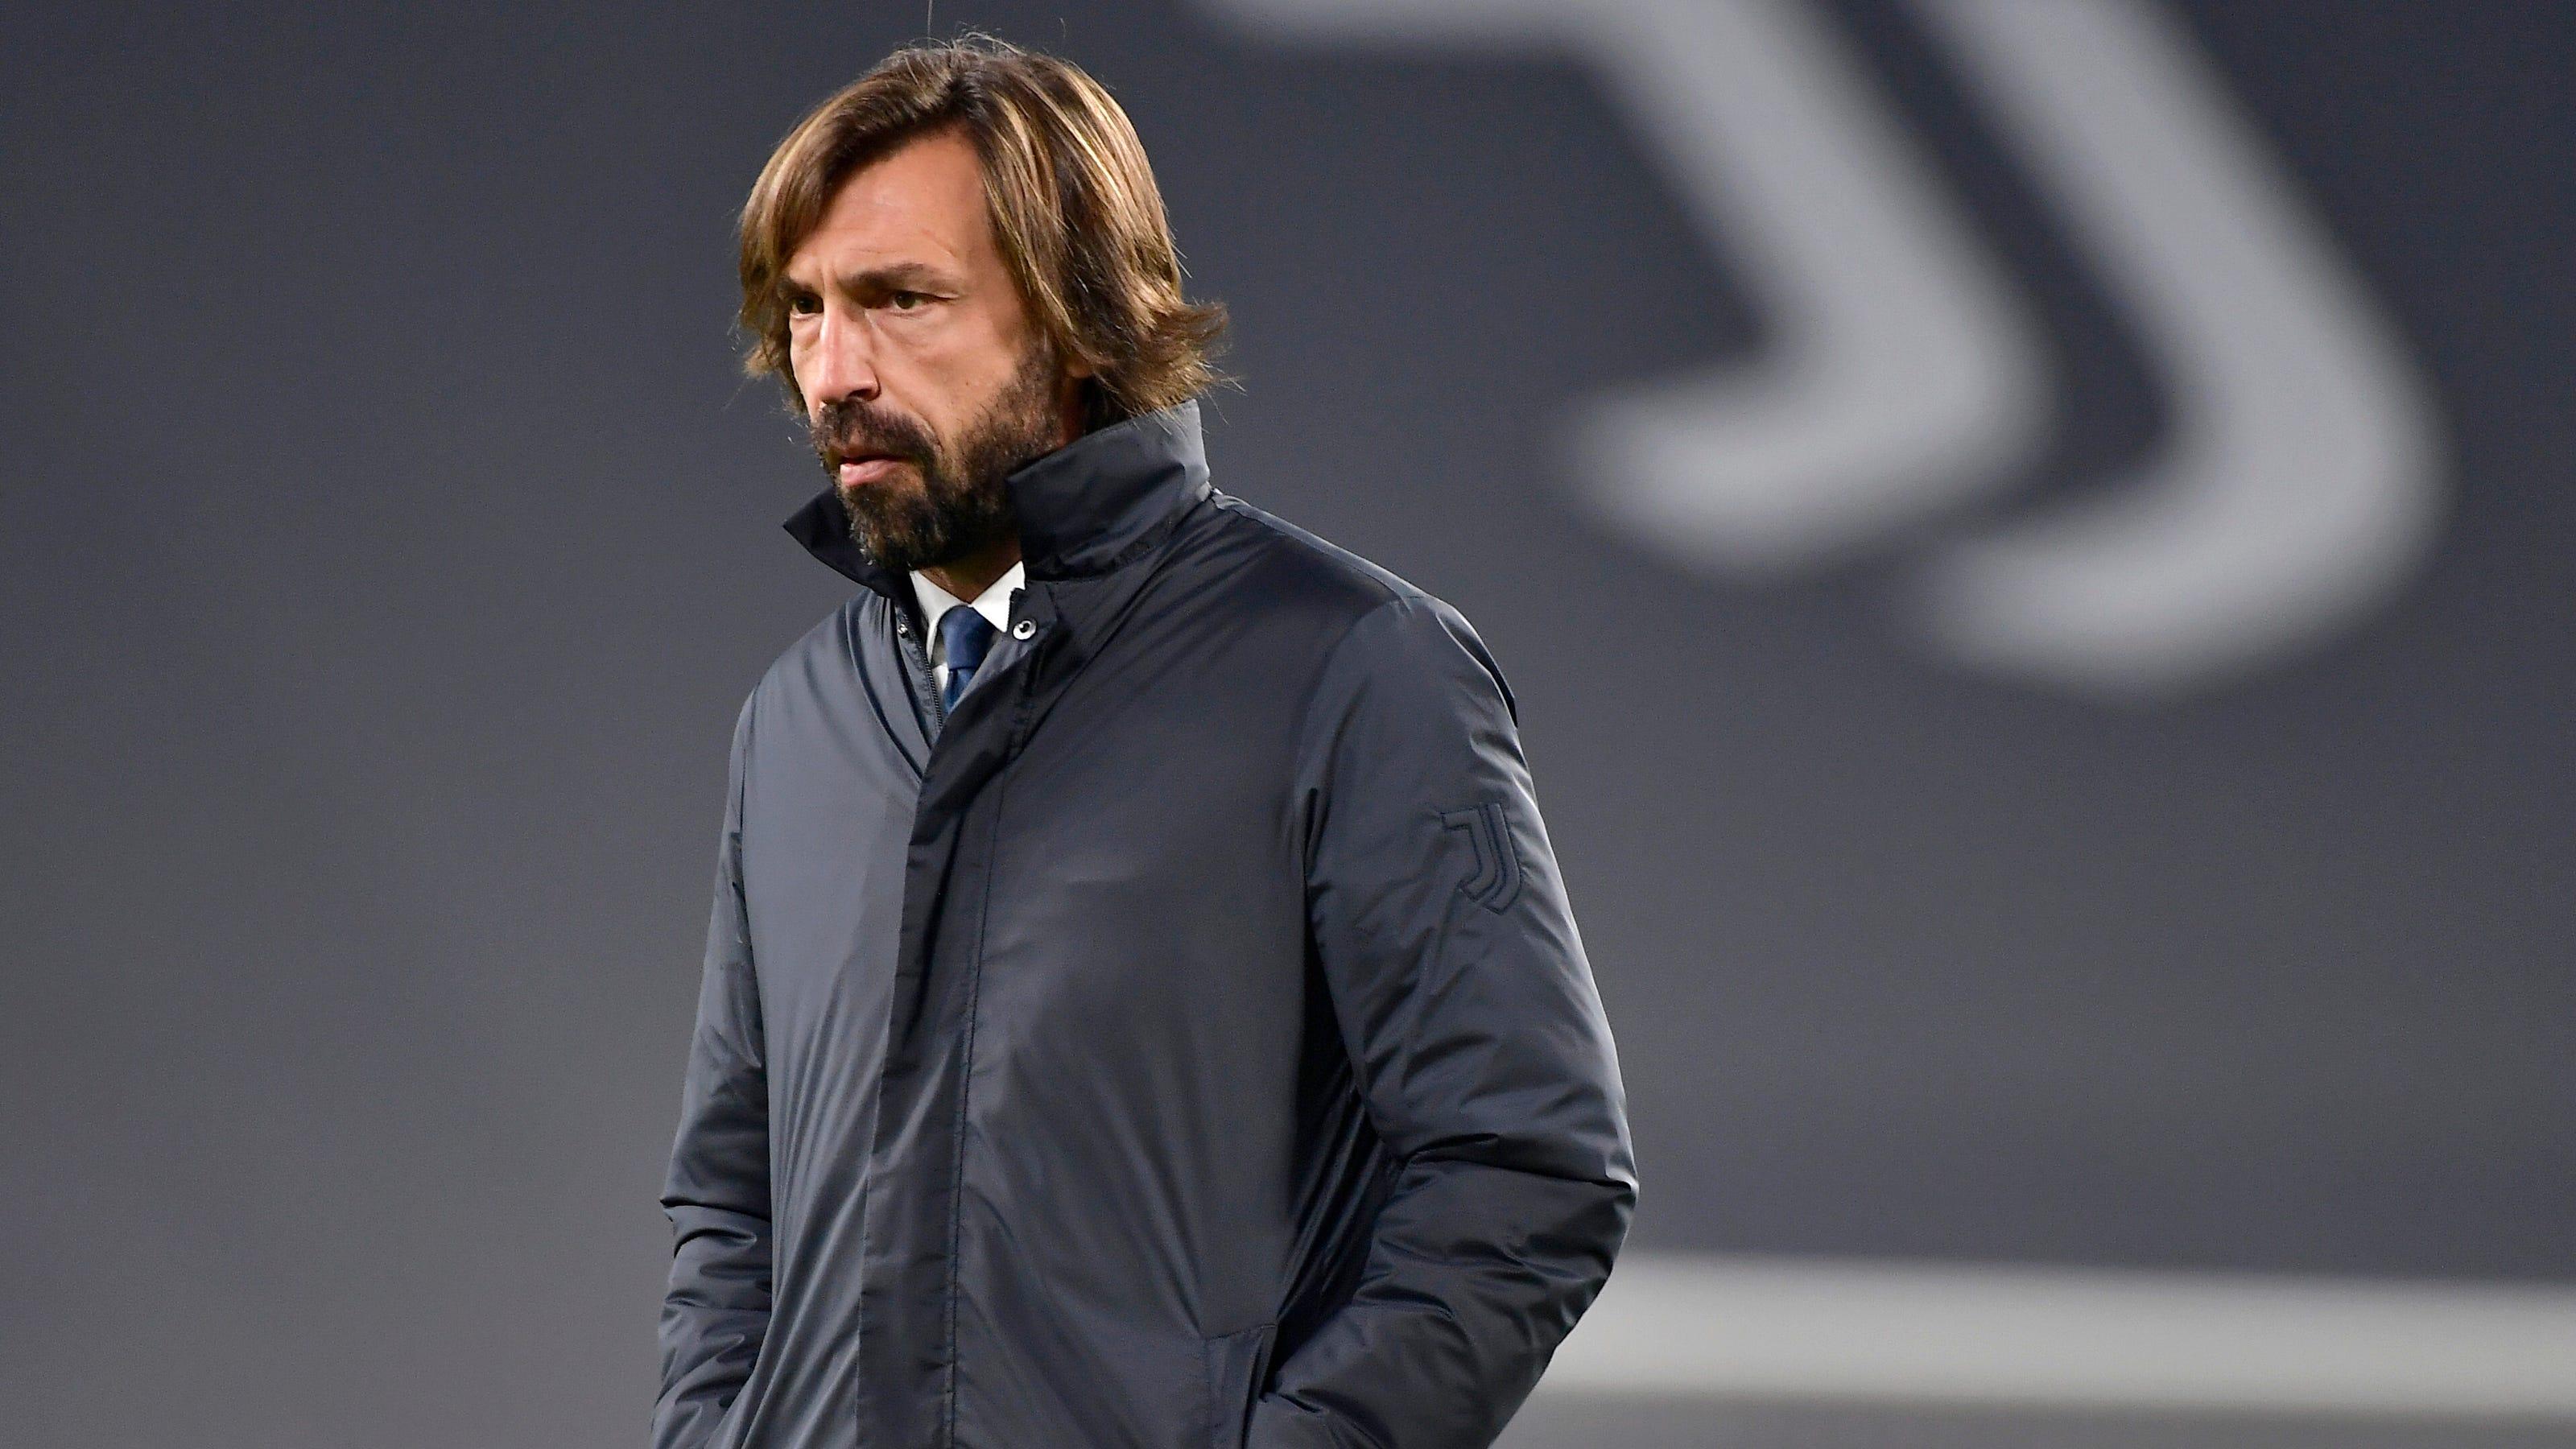 Morata's late goal sends Juventus to the next round